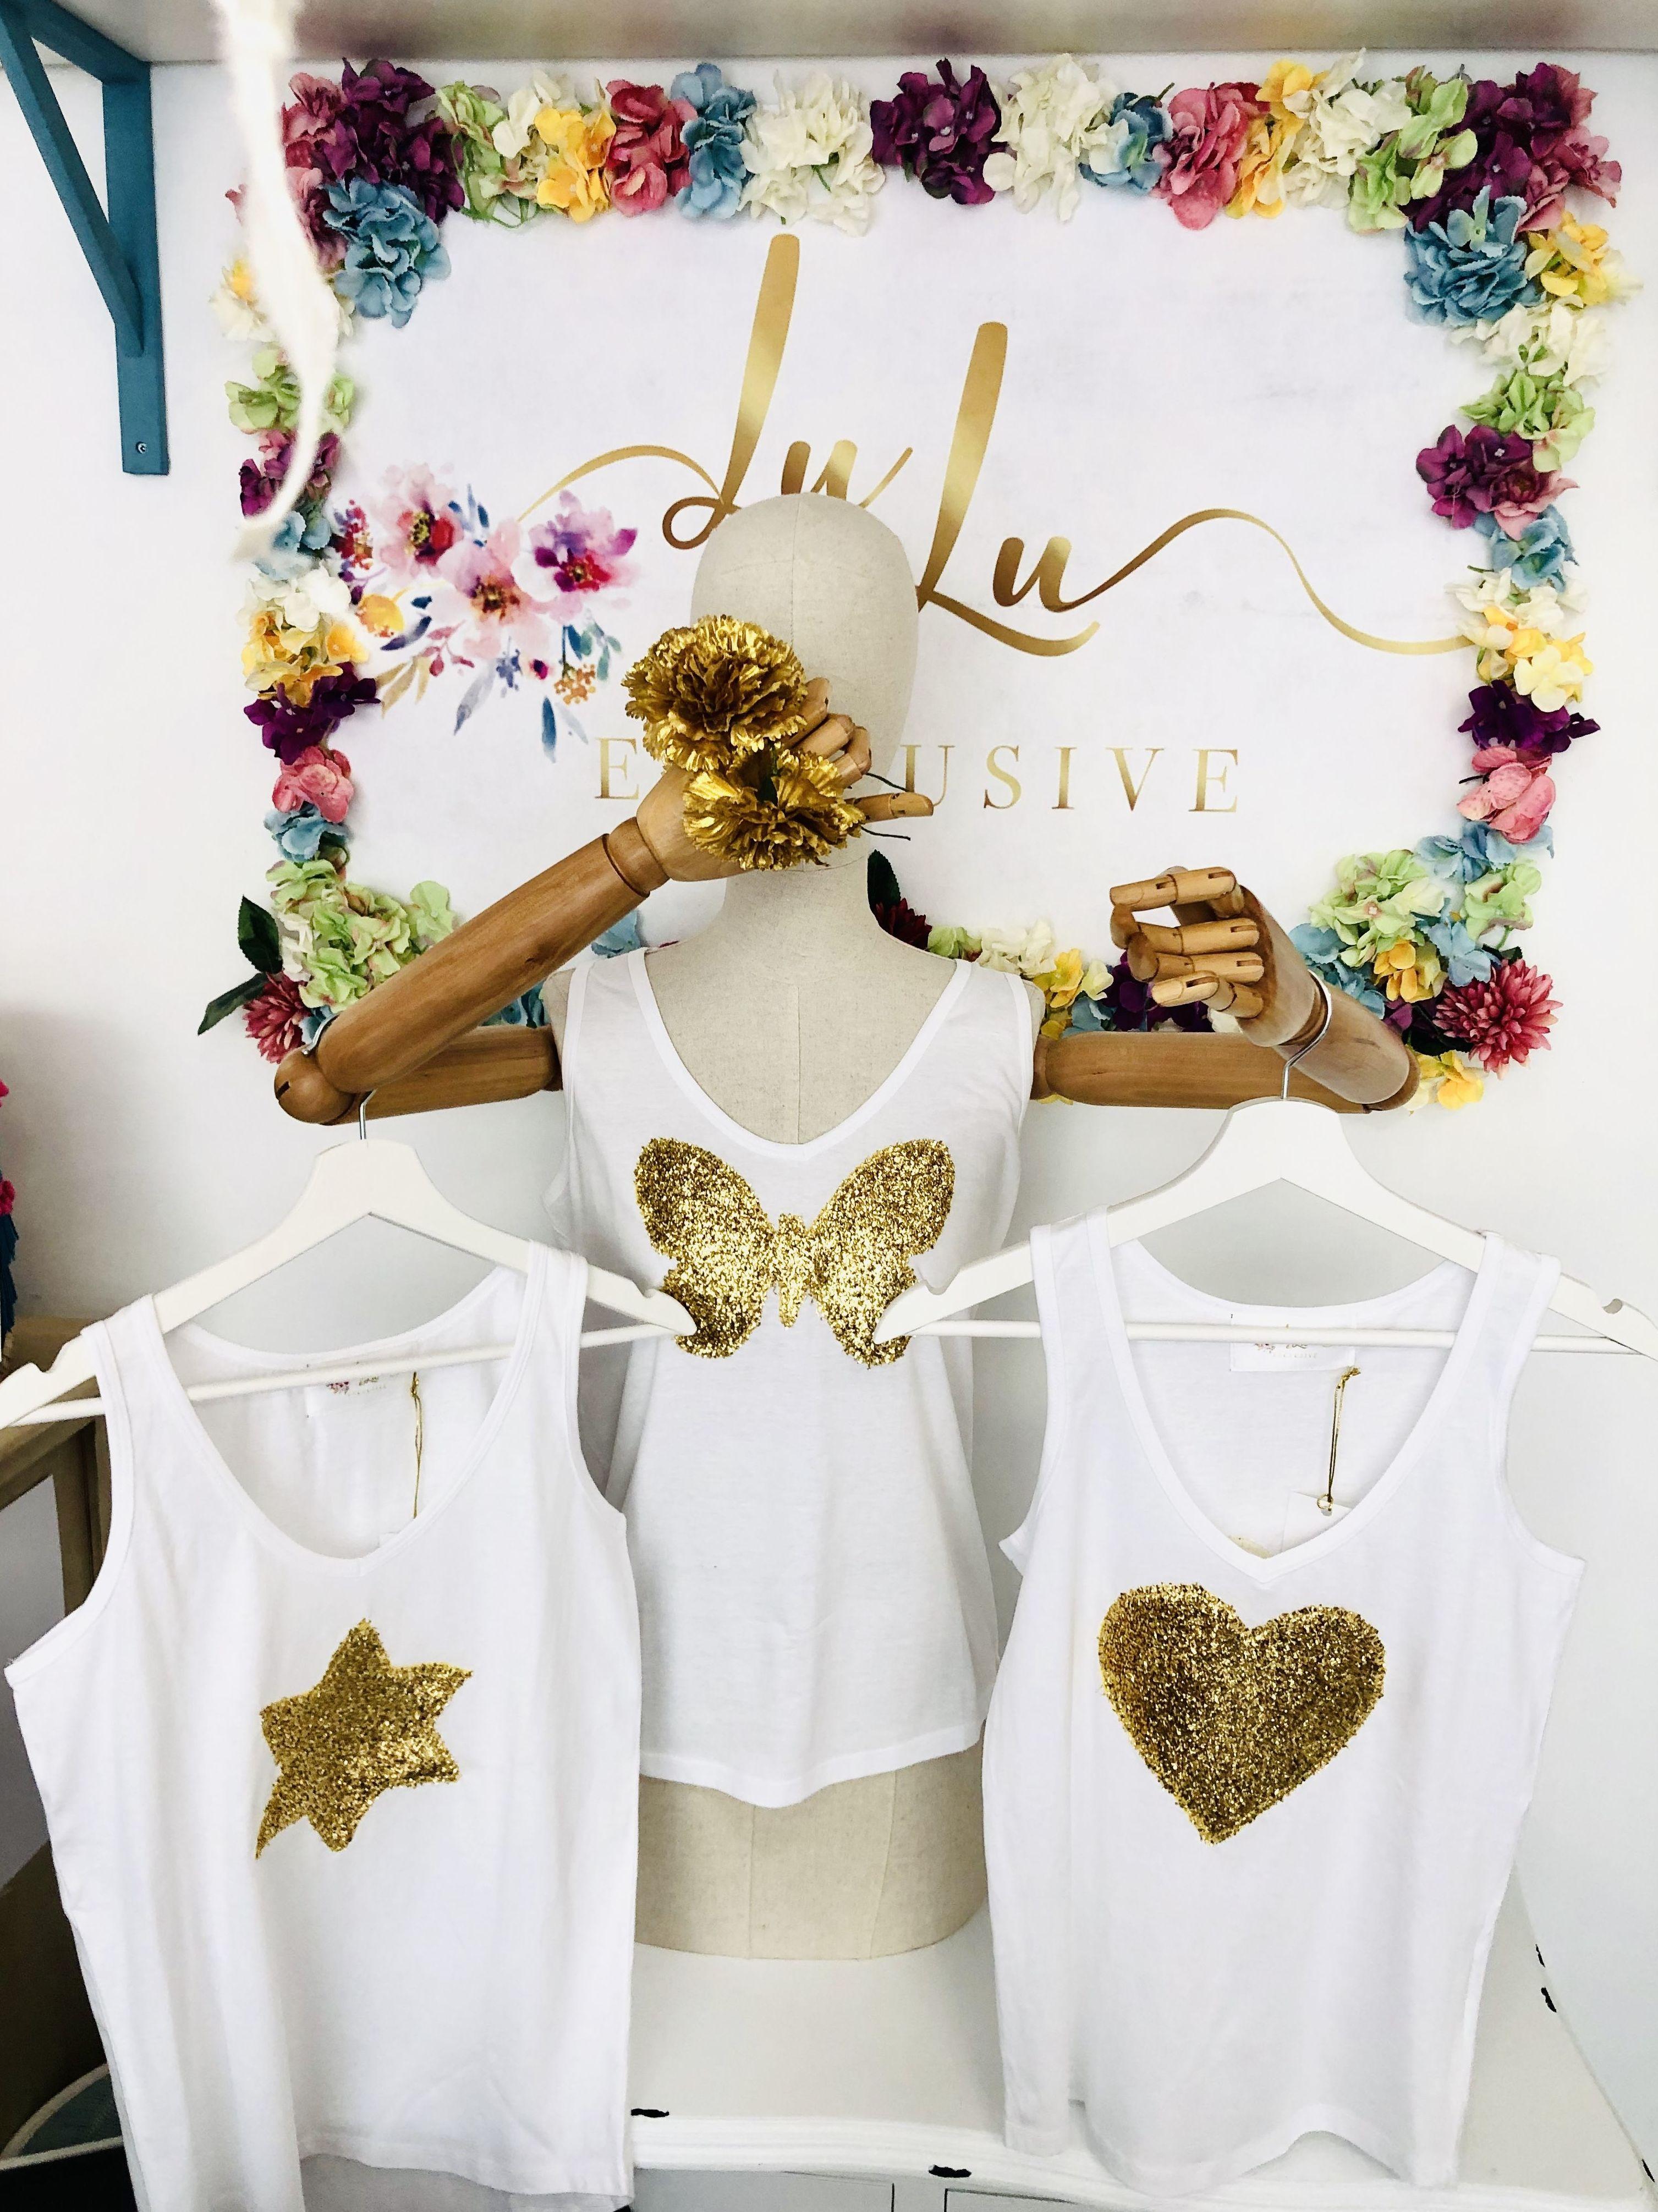 Foto 34 de Fashion accessories en  | Lu & Lu Exclusive